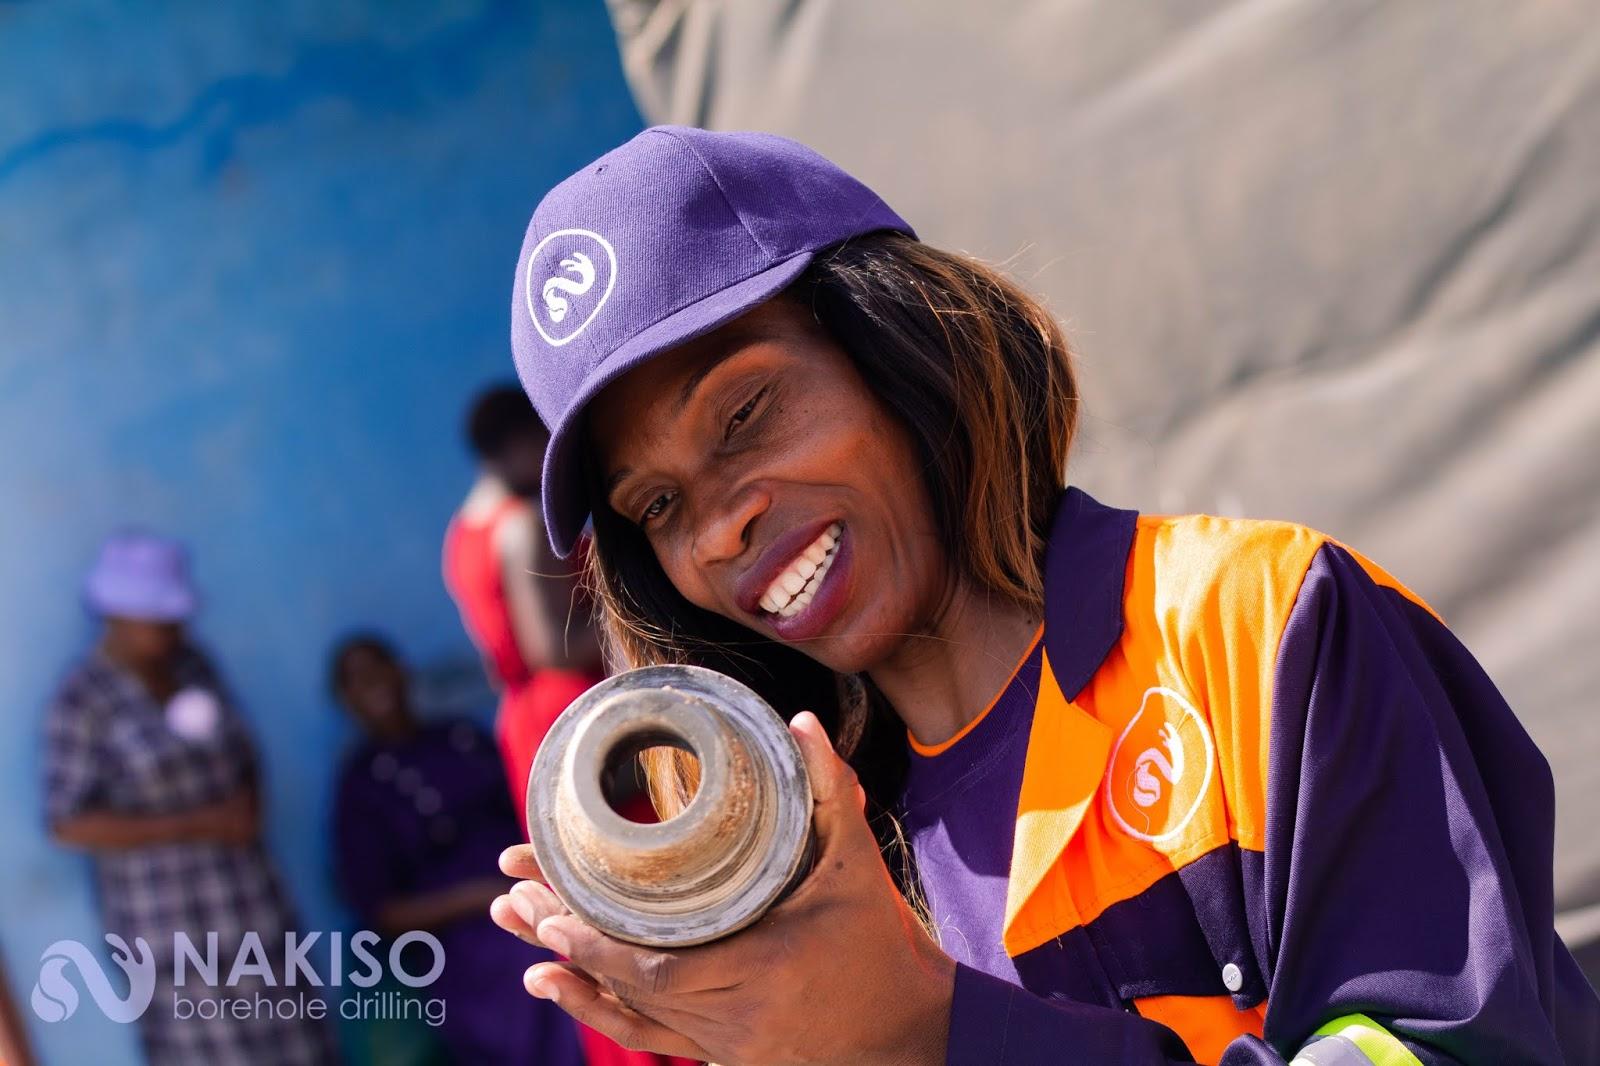 Nakiso Borehole Drilling Gives Back To The Community!